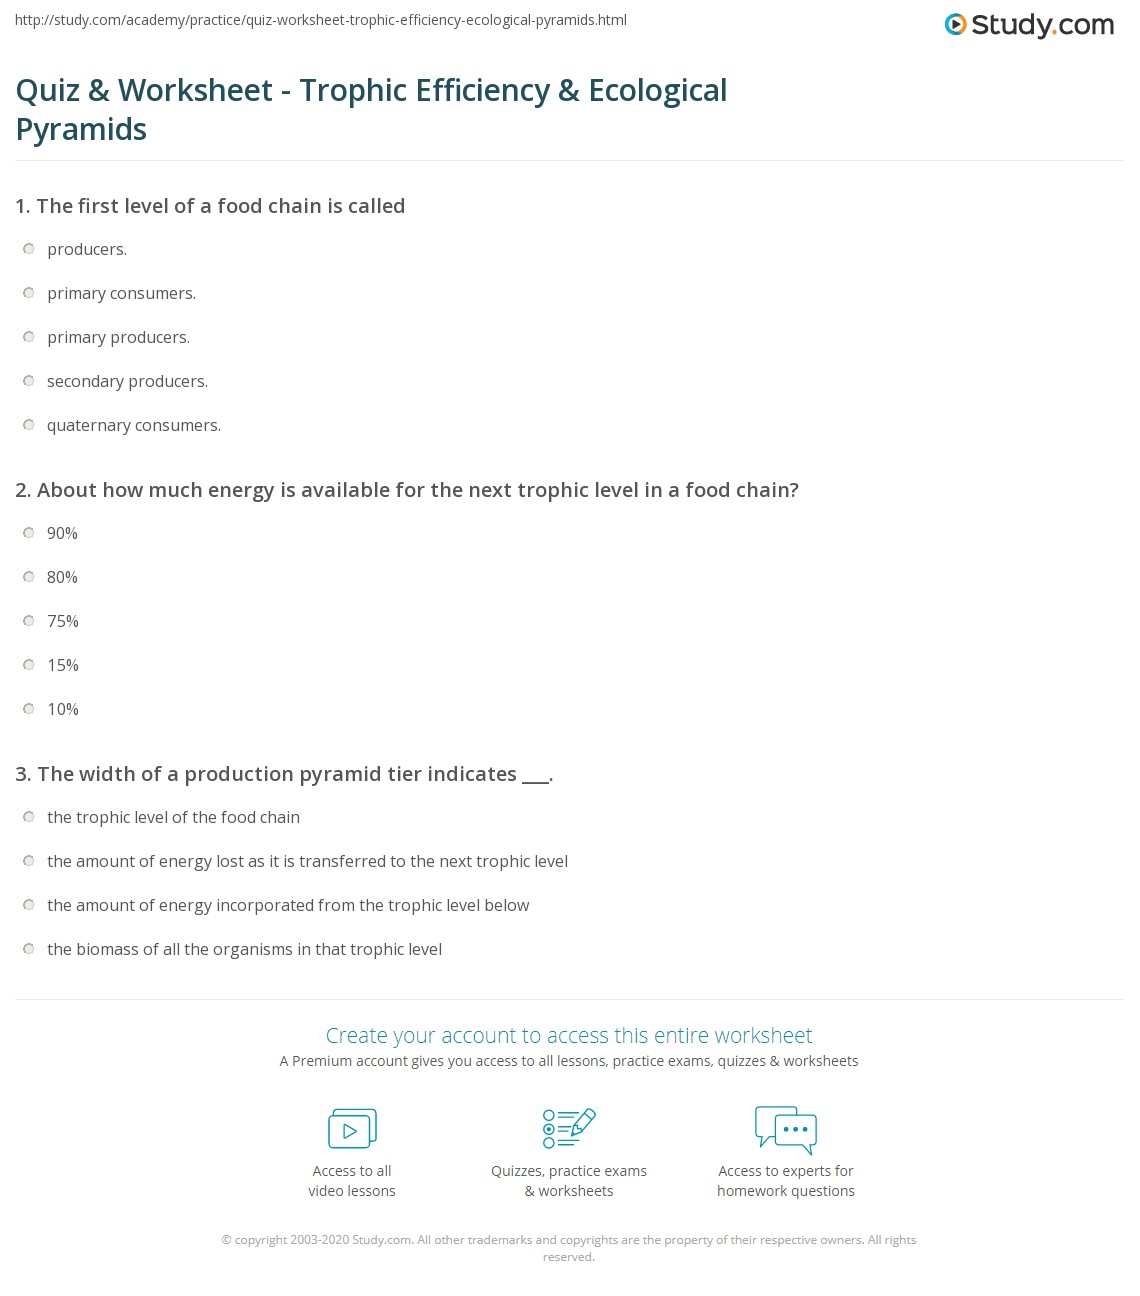 Quiz & Worksheet - Trophic Efficiency & Ecological Pyramids ...